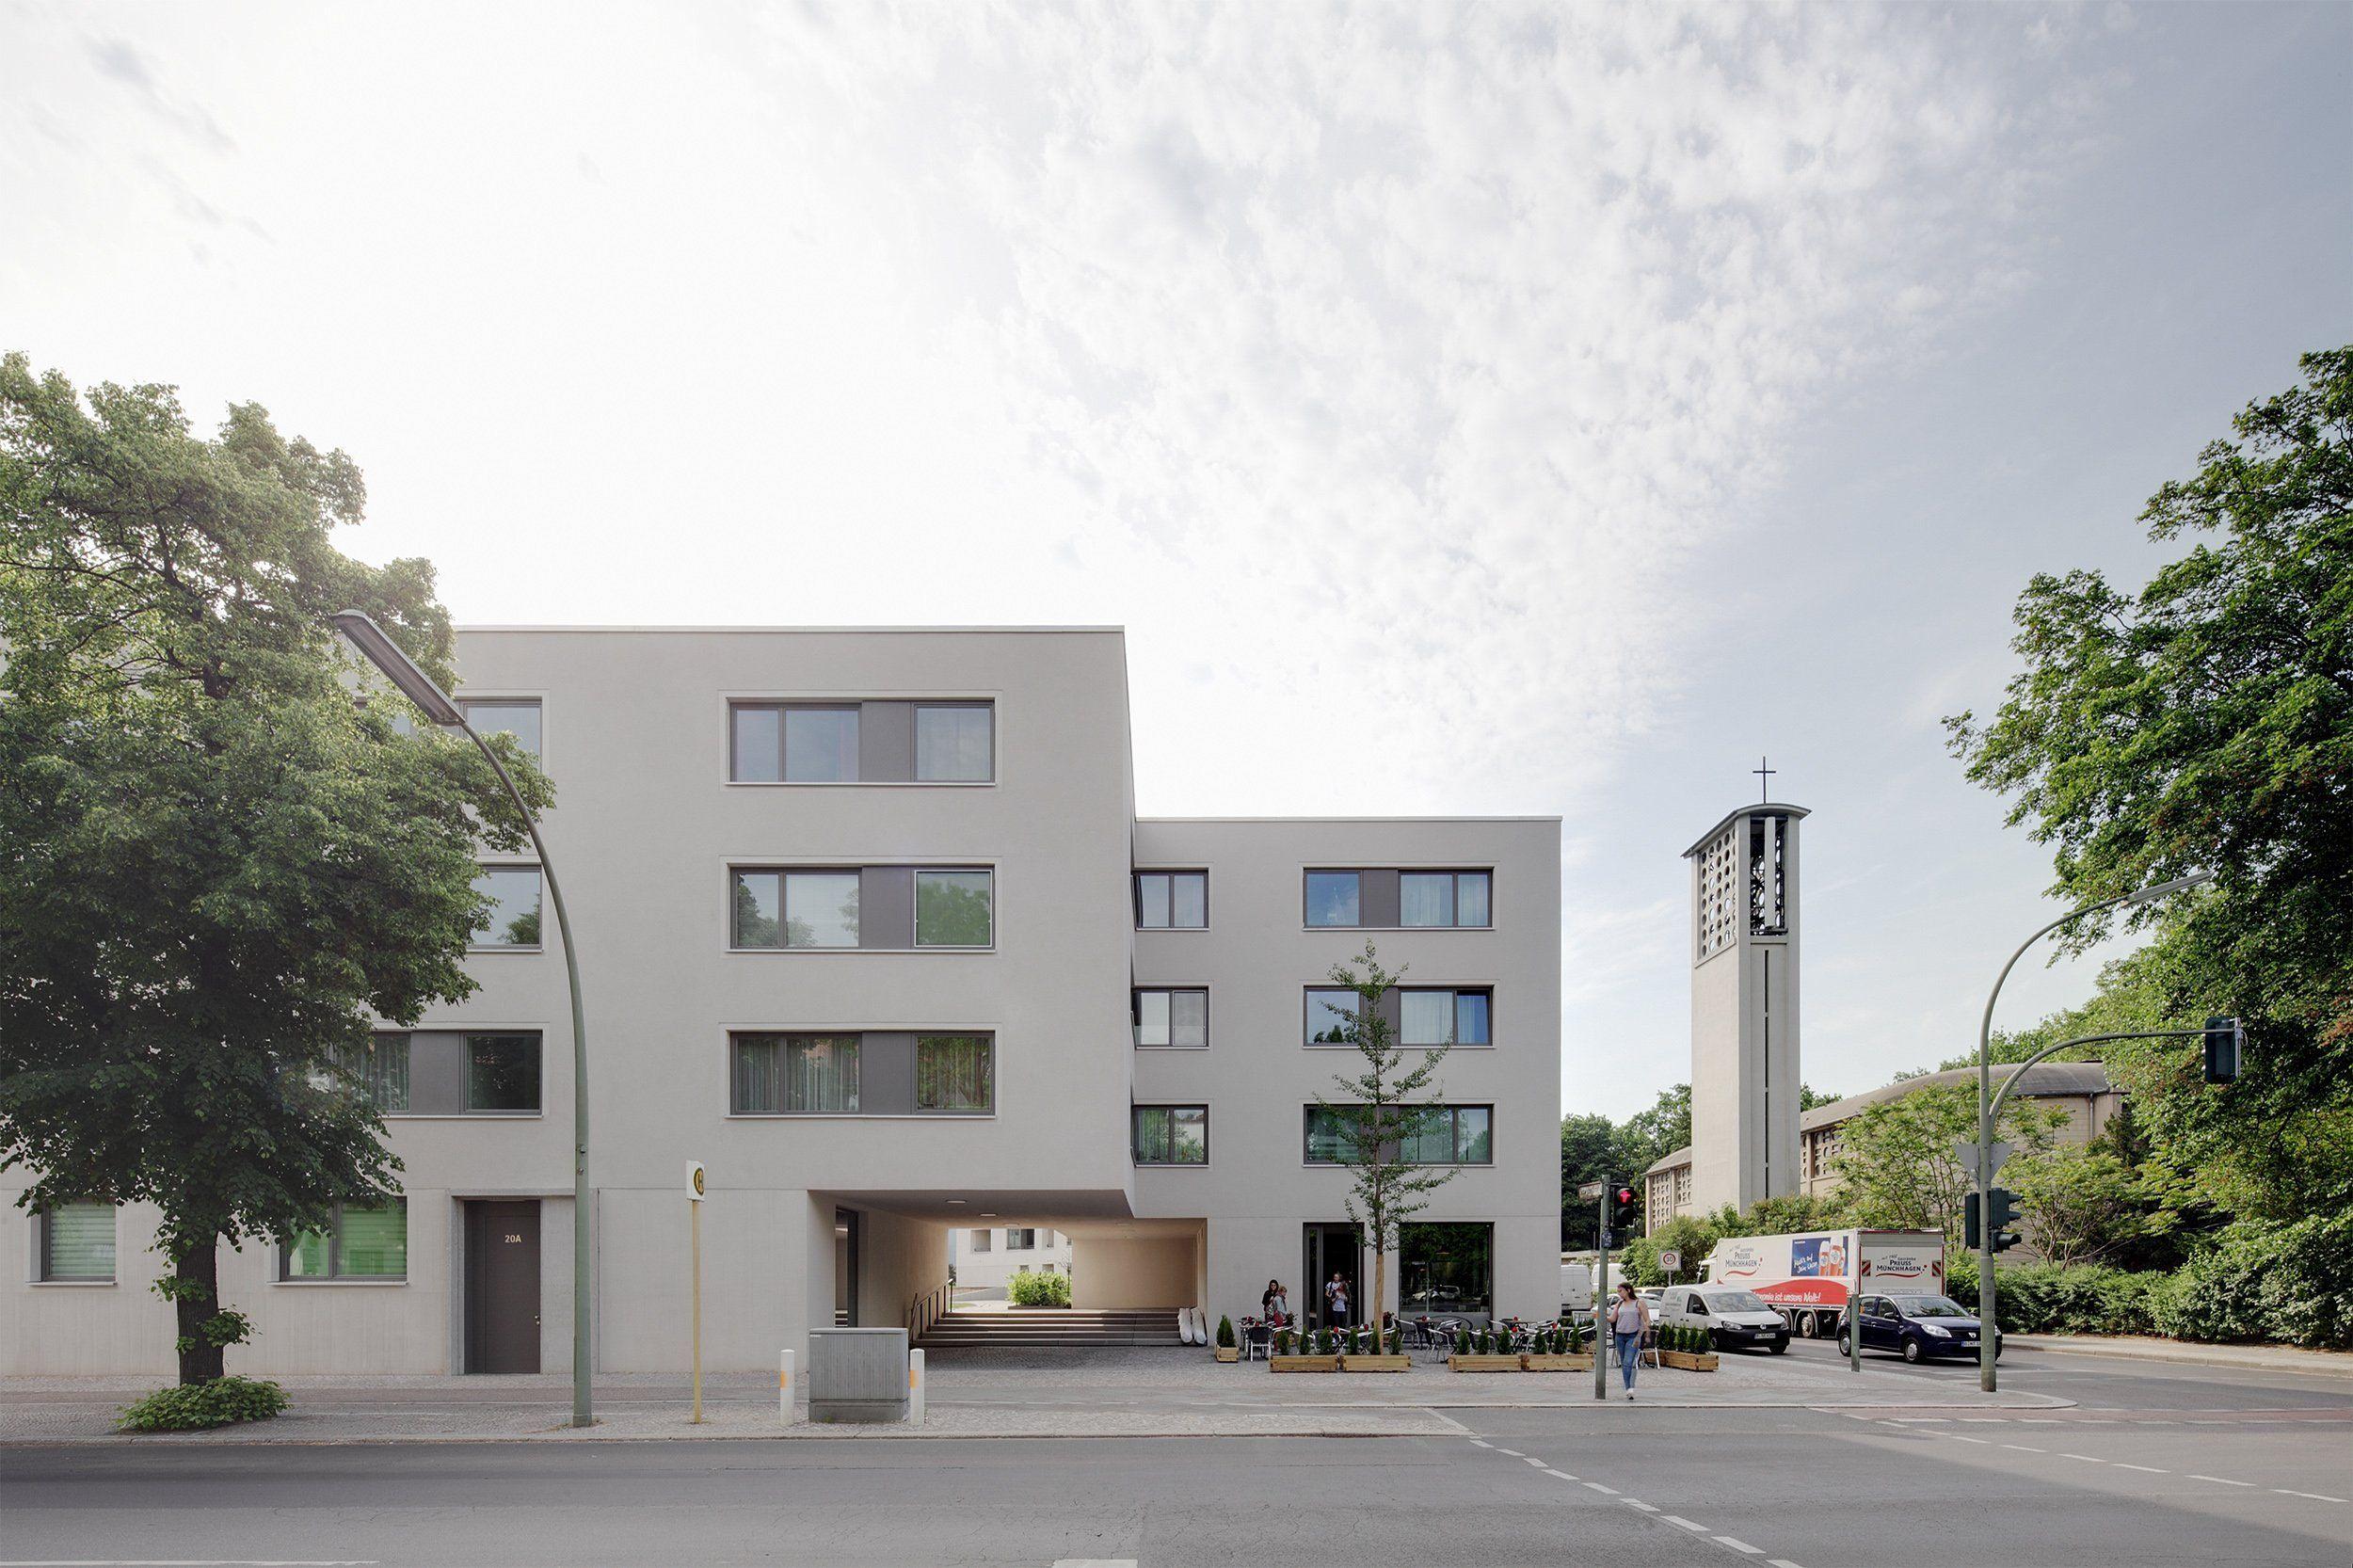 Residential Building Bruno Taut Siedlung Schillerpark Berlin